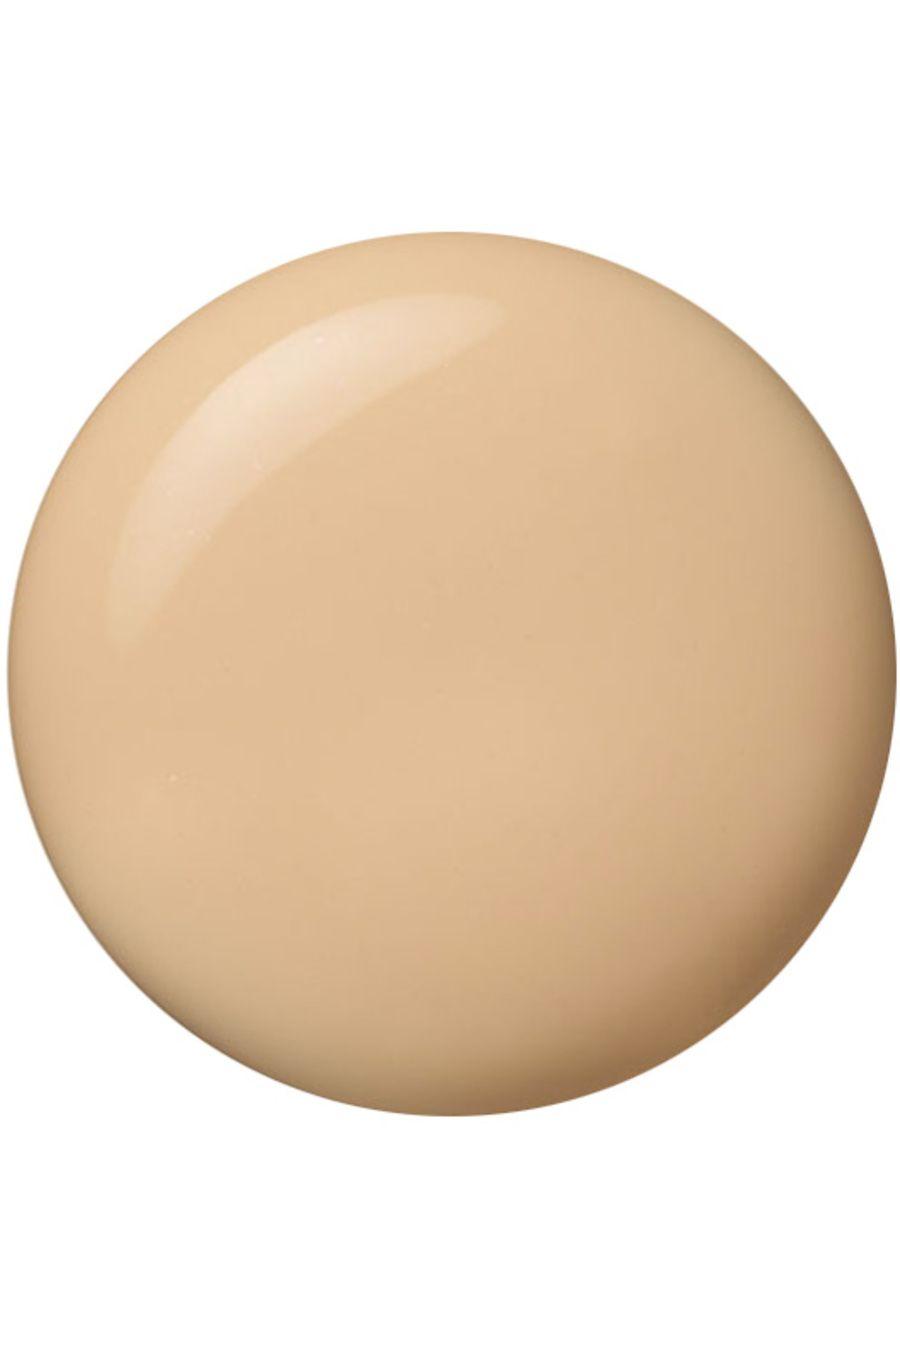 Blissim : Paul & Joe - Base de Maquillage Hydratante - Miel 02